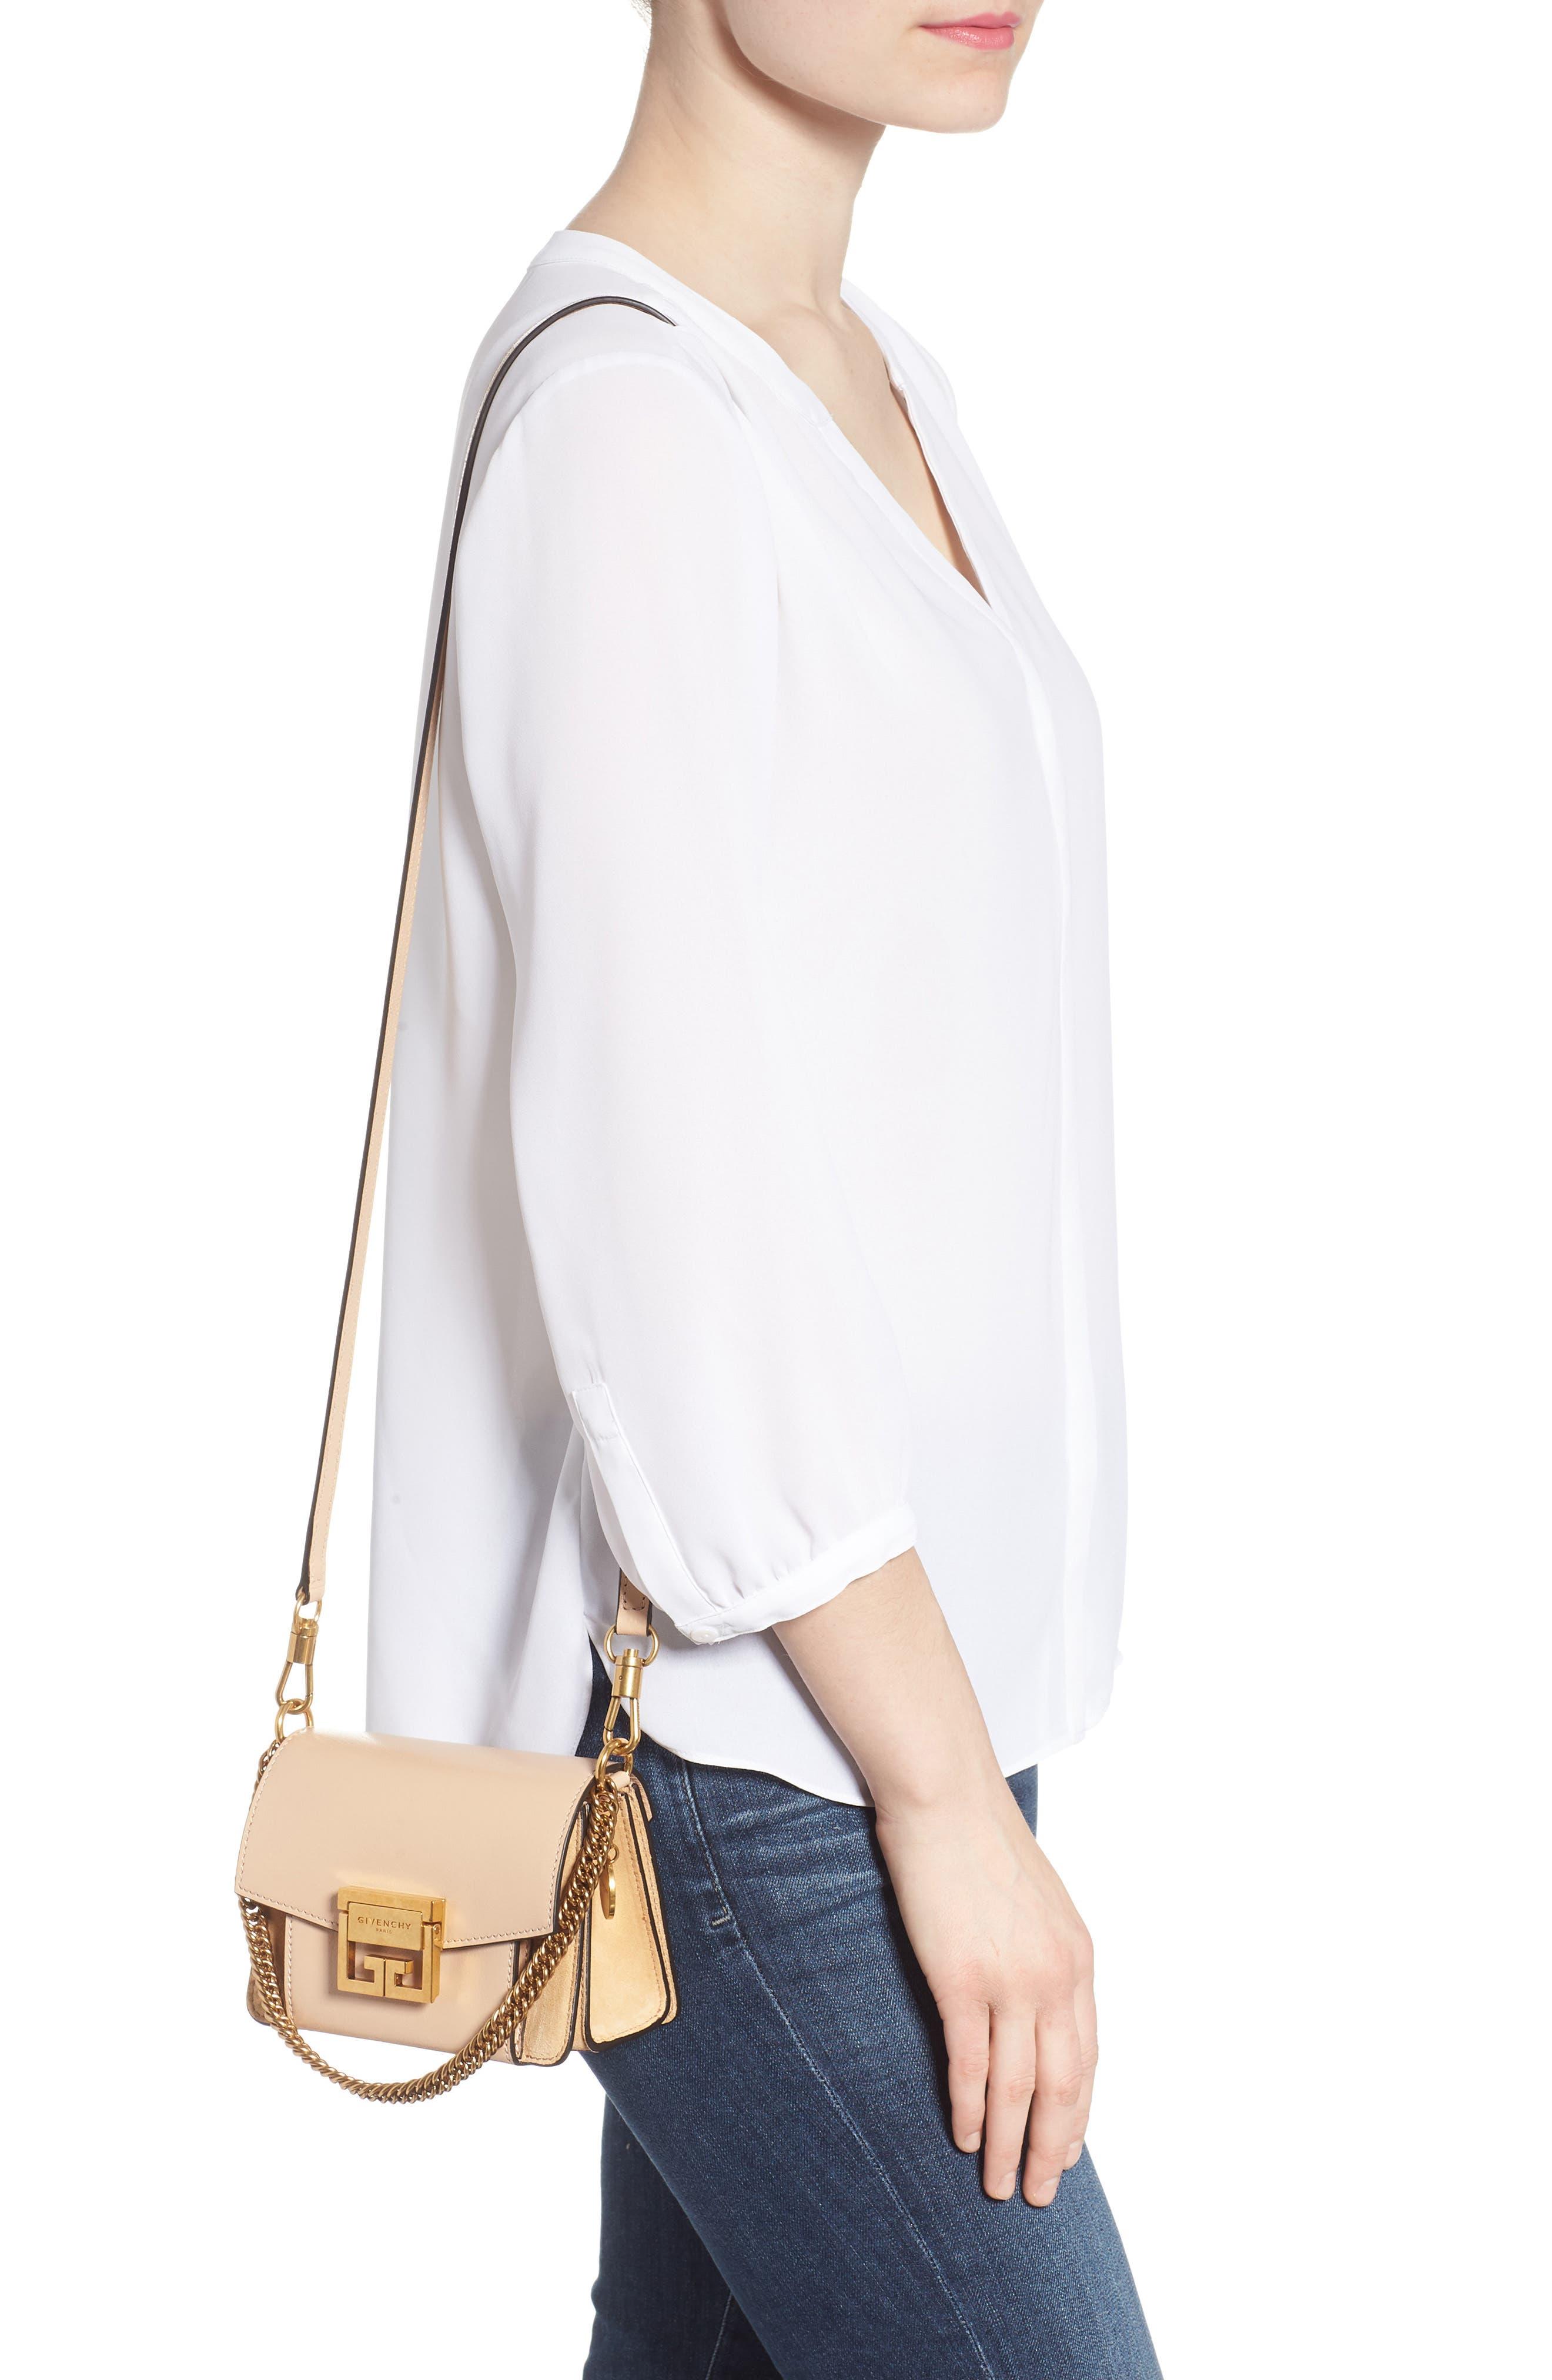 Mini GV3 Leather & Suede Crossbody Bag,                             Alternate thumbnail 2, color,                             Nude/ Light Beige